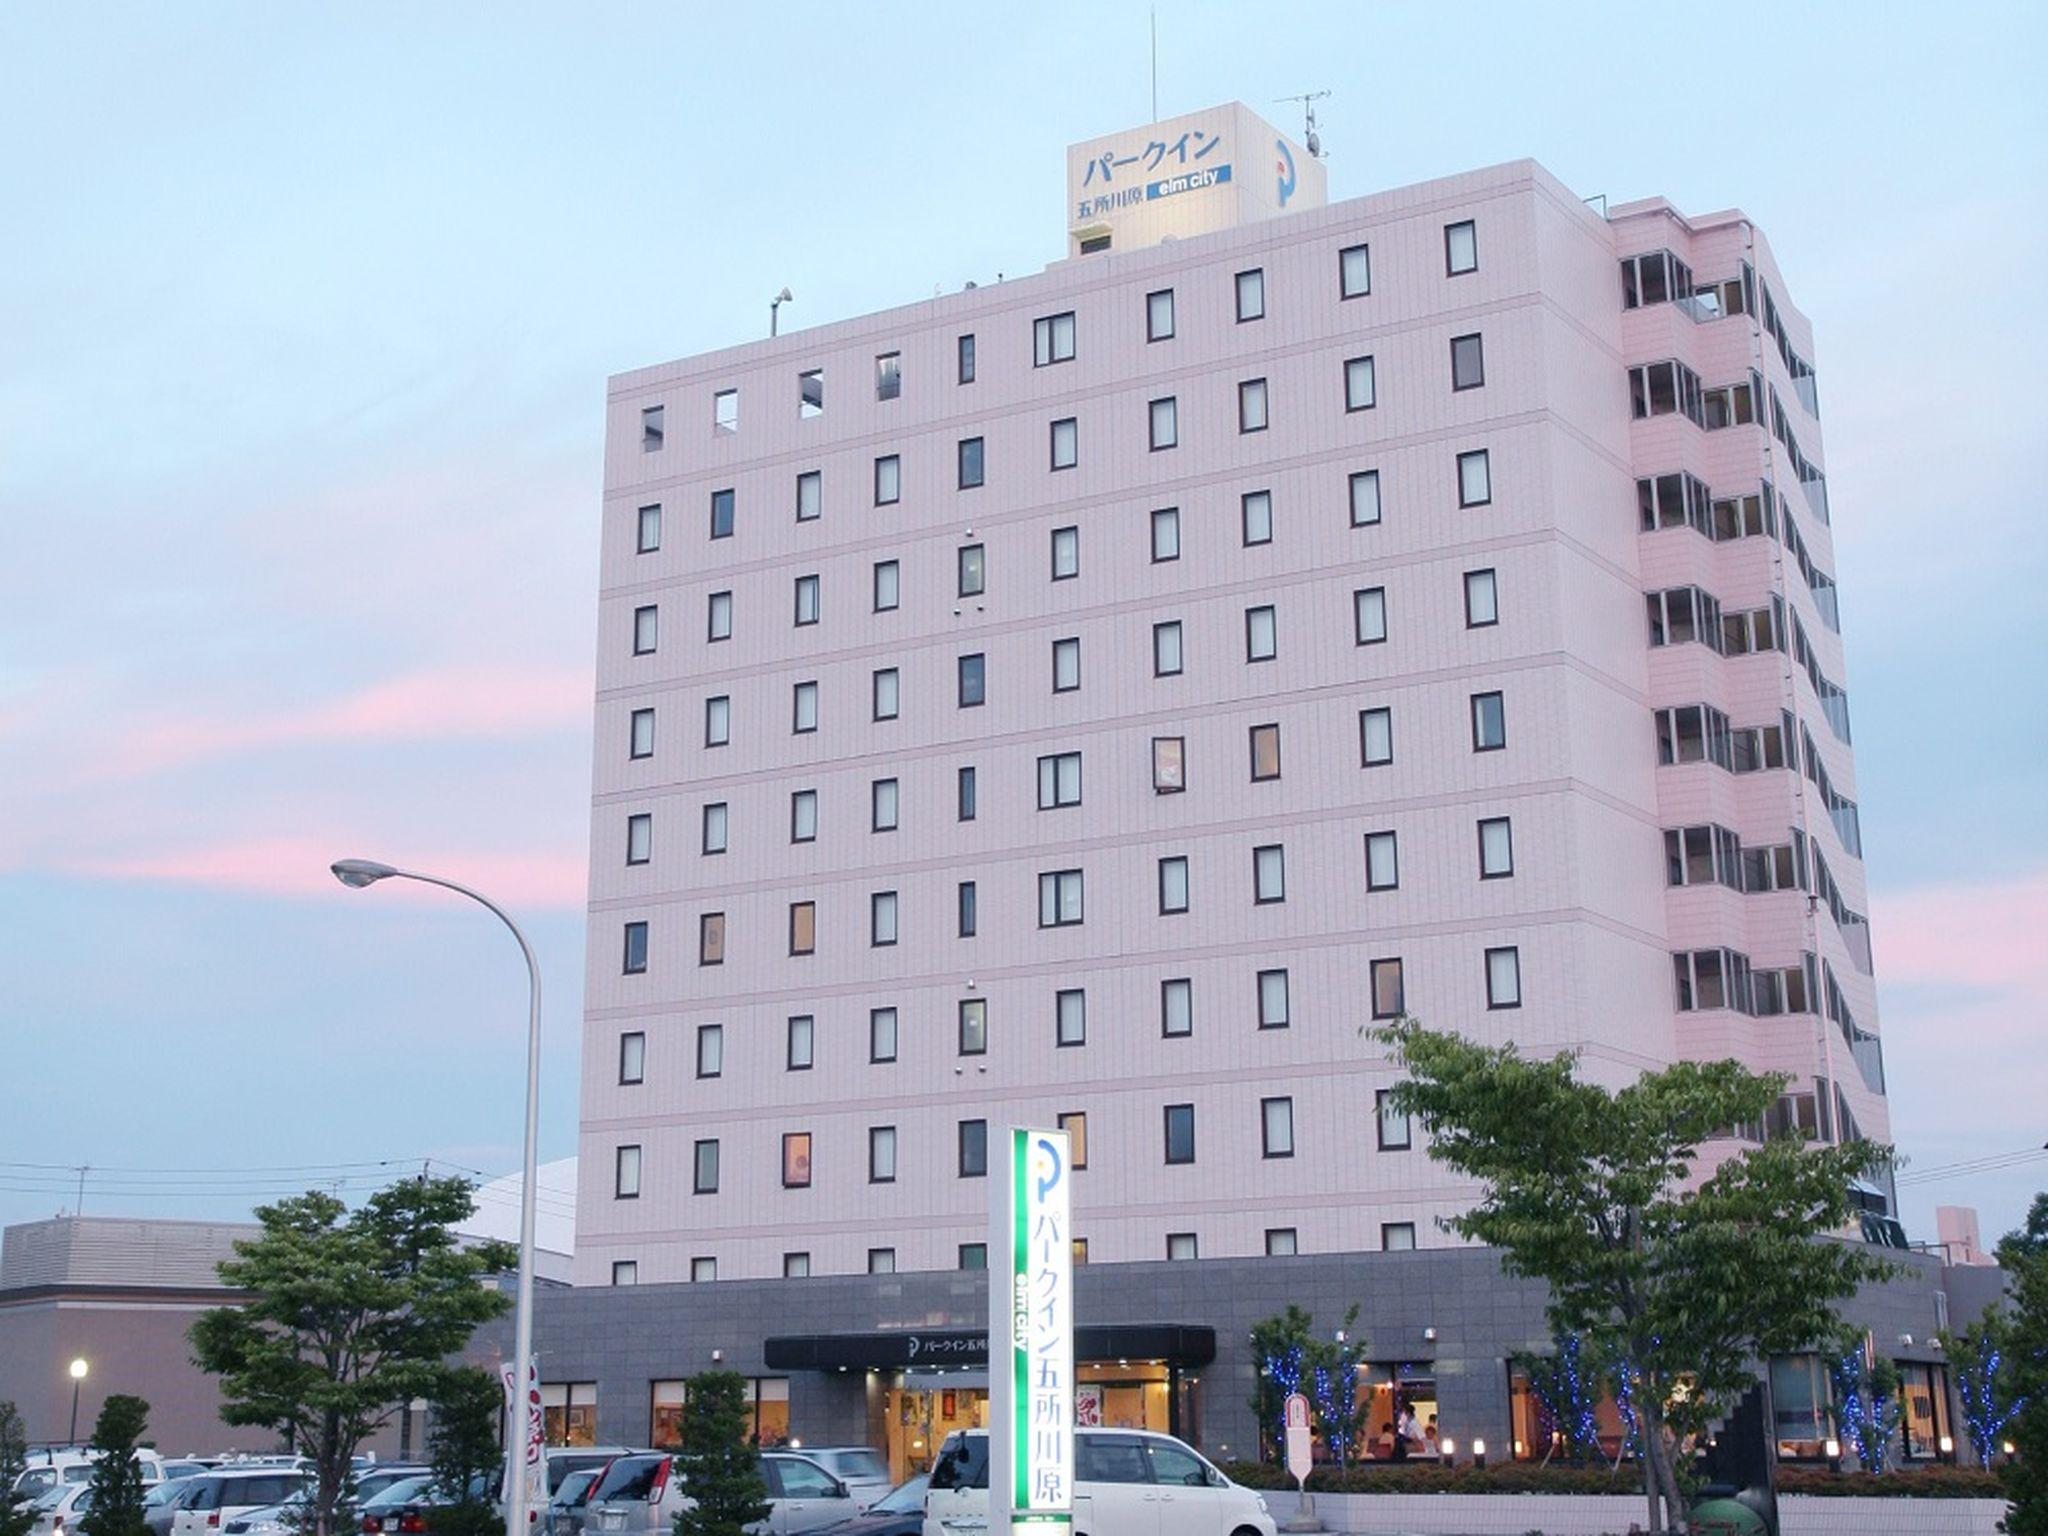 Park Inn Goshogawara Elmcity